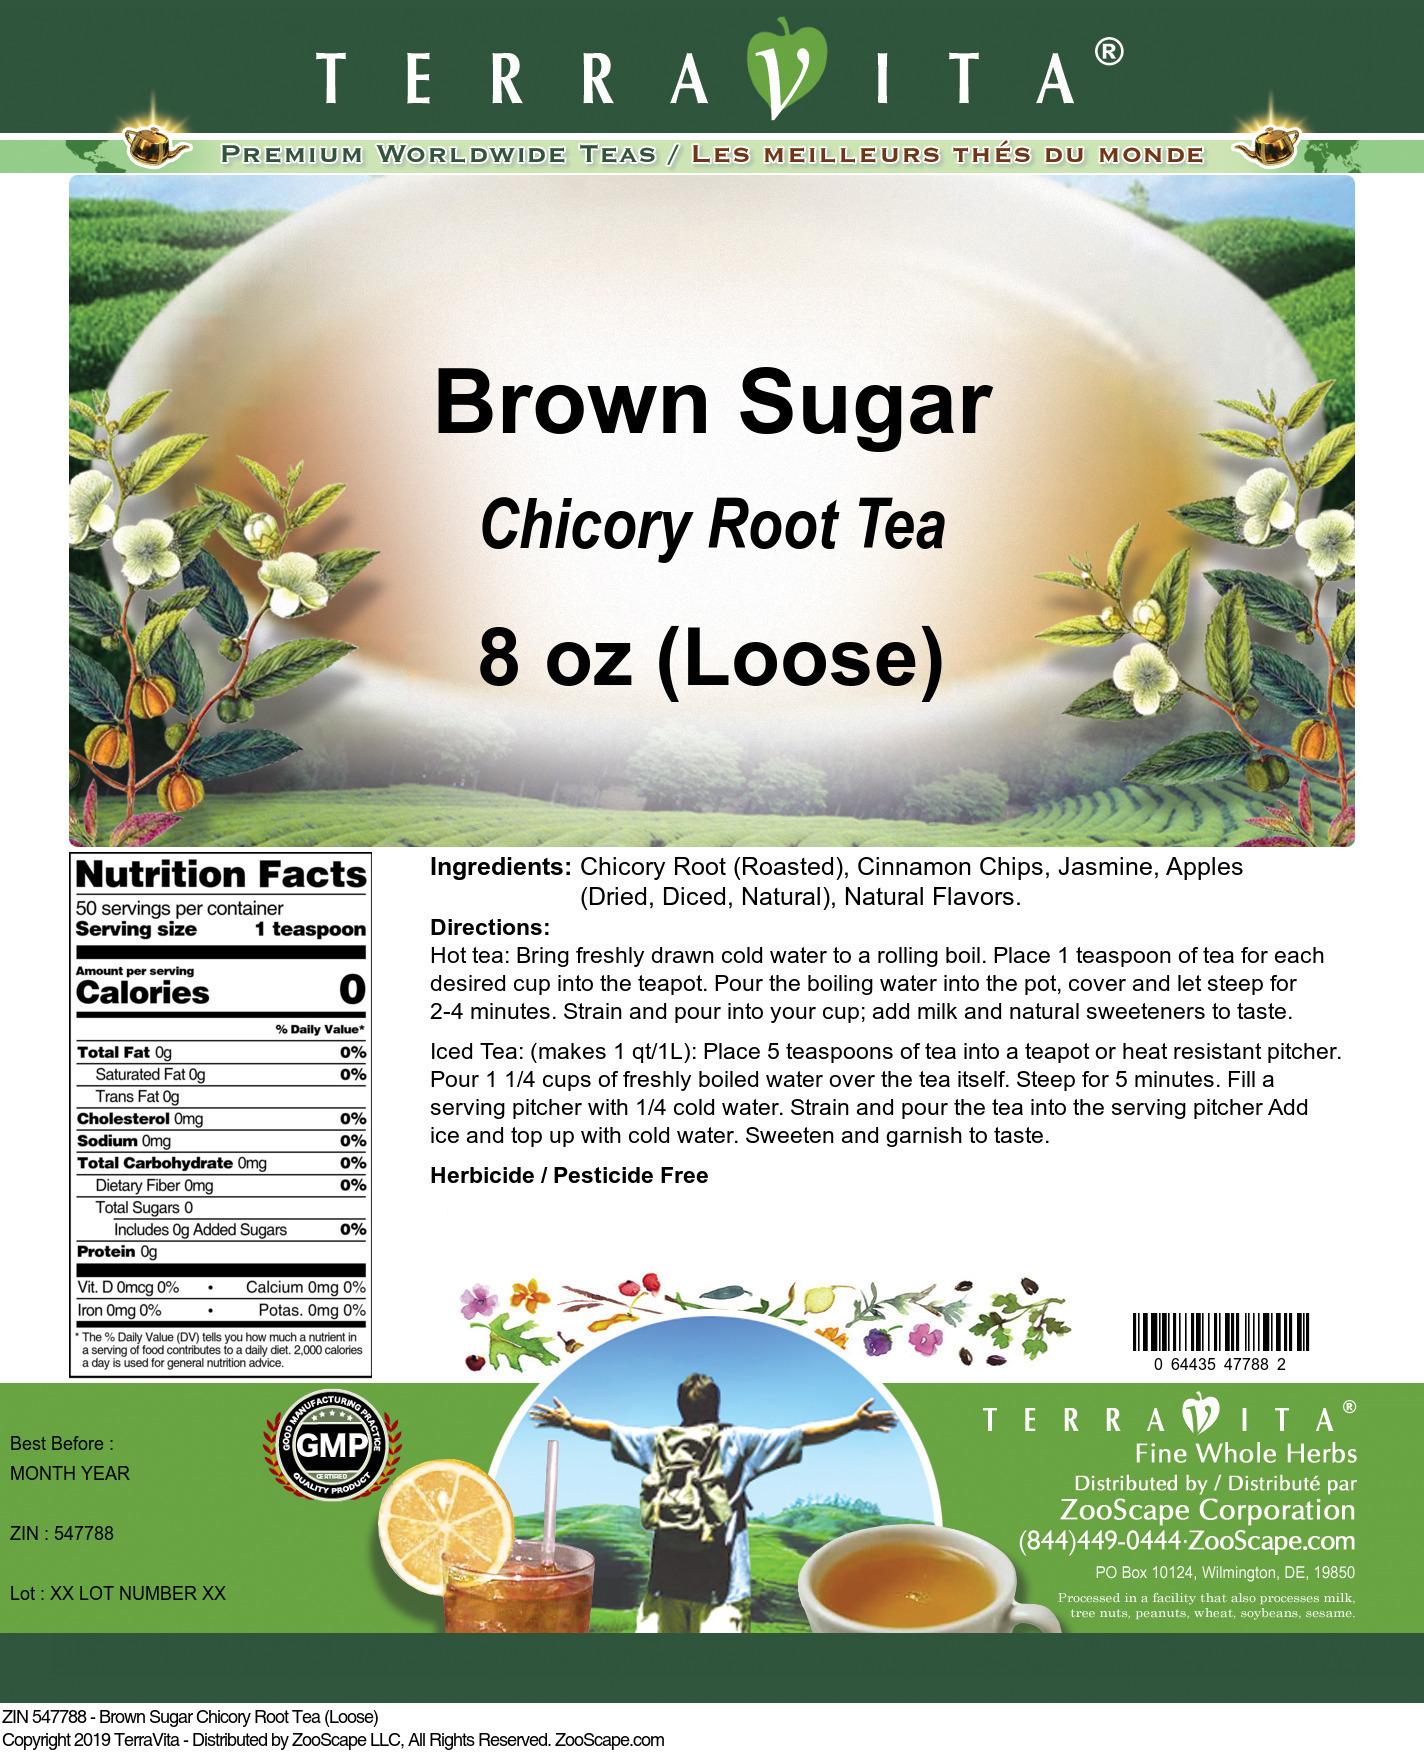 Brown Sugar Chicory Root